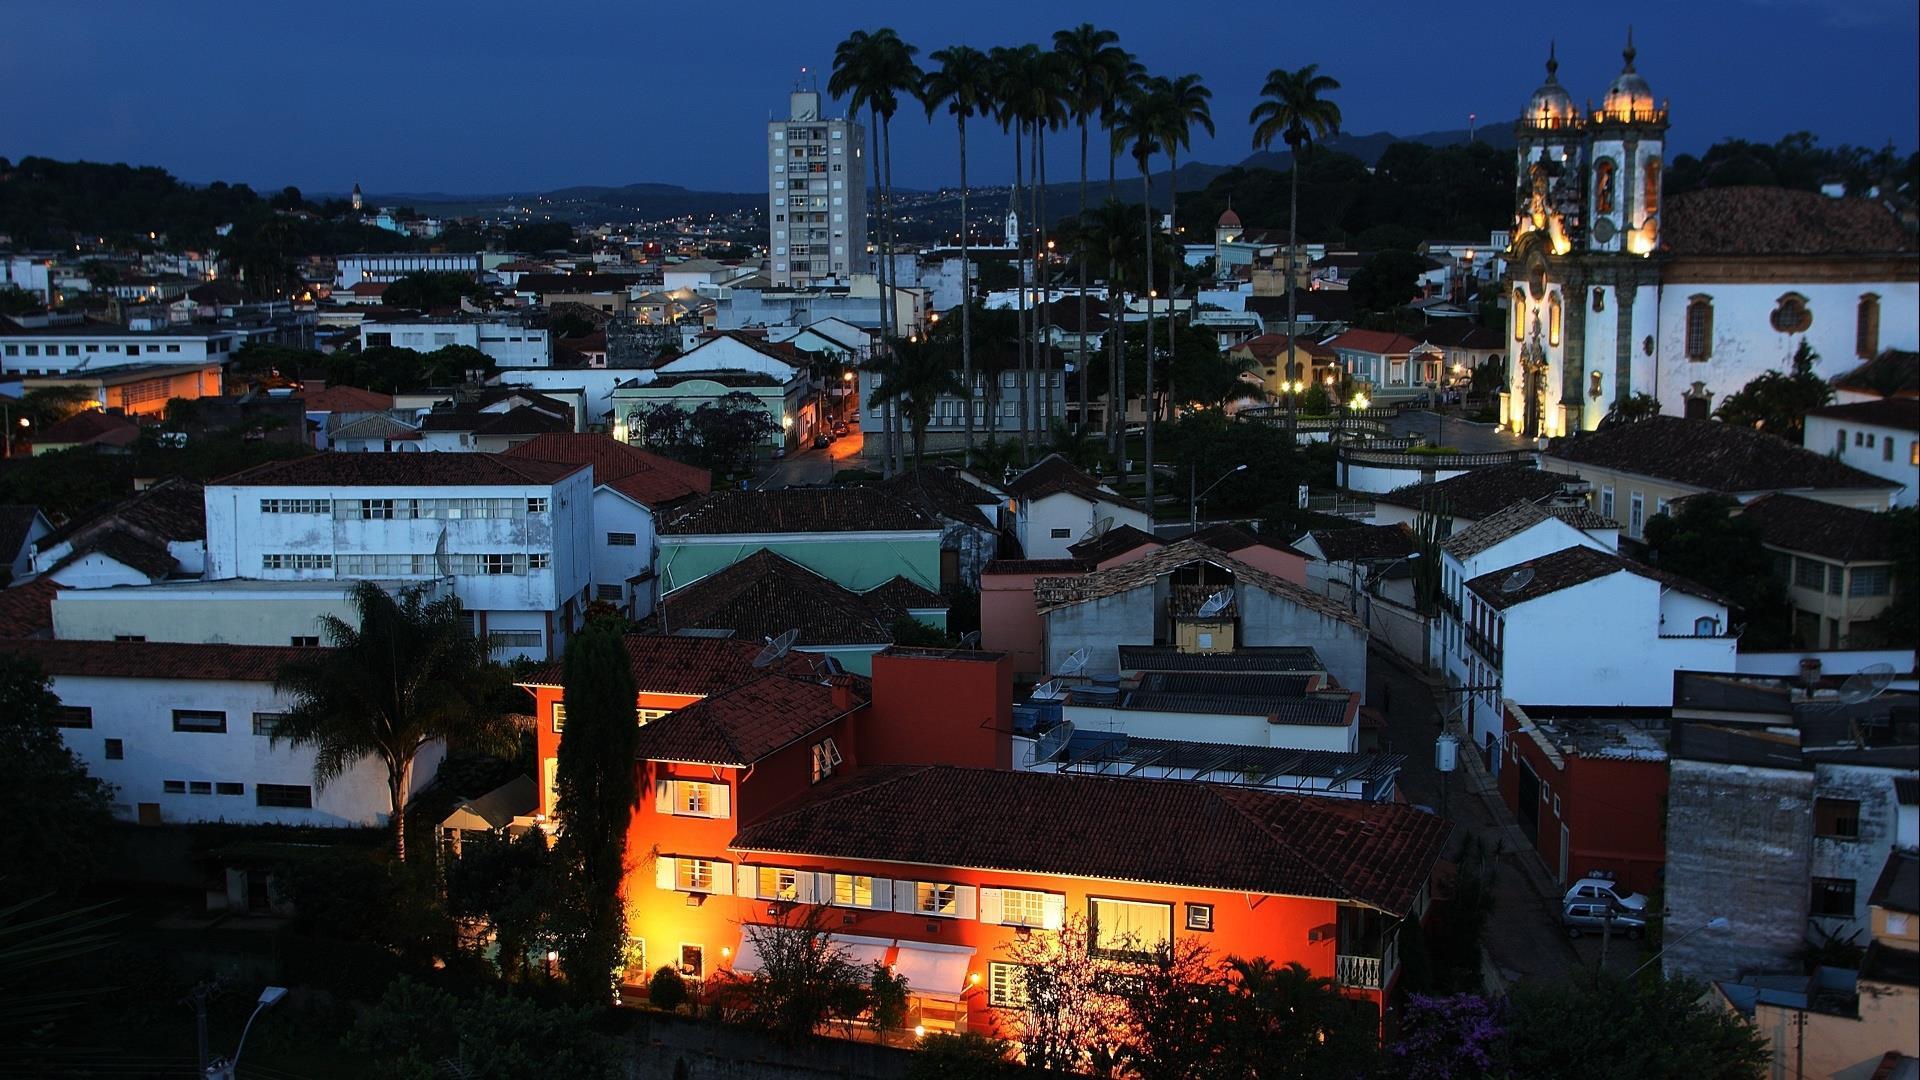 Brasilien Sao Joao del Rei: Landestypische Unterkunft - Pousada Beco do Bispo